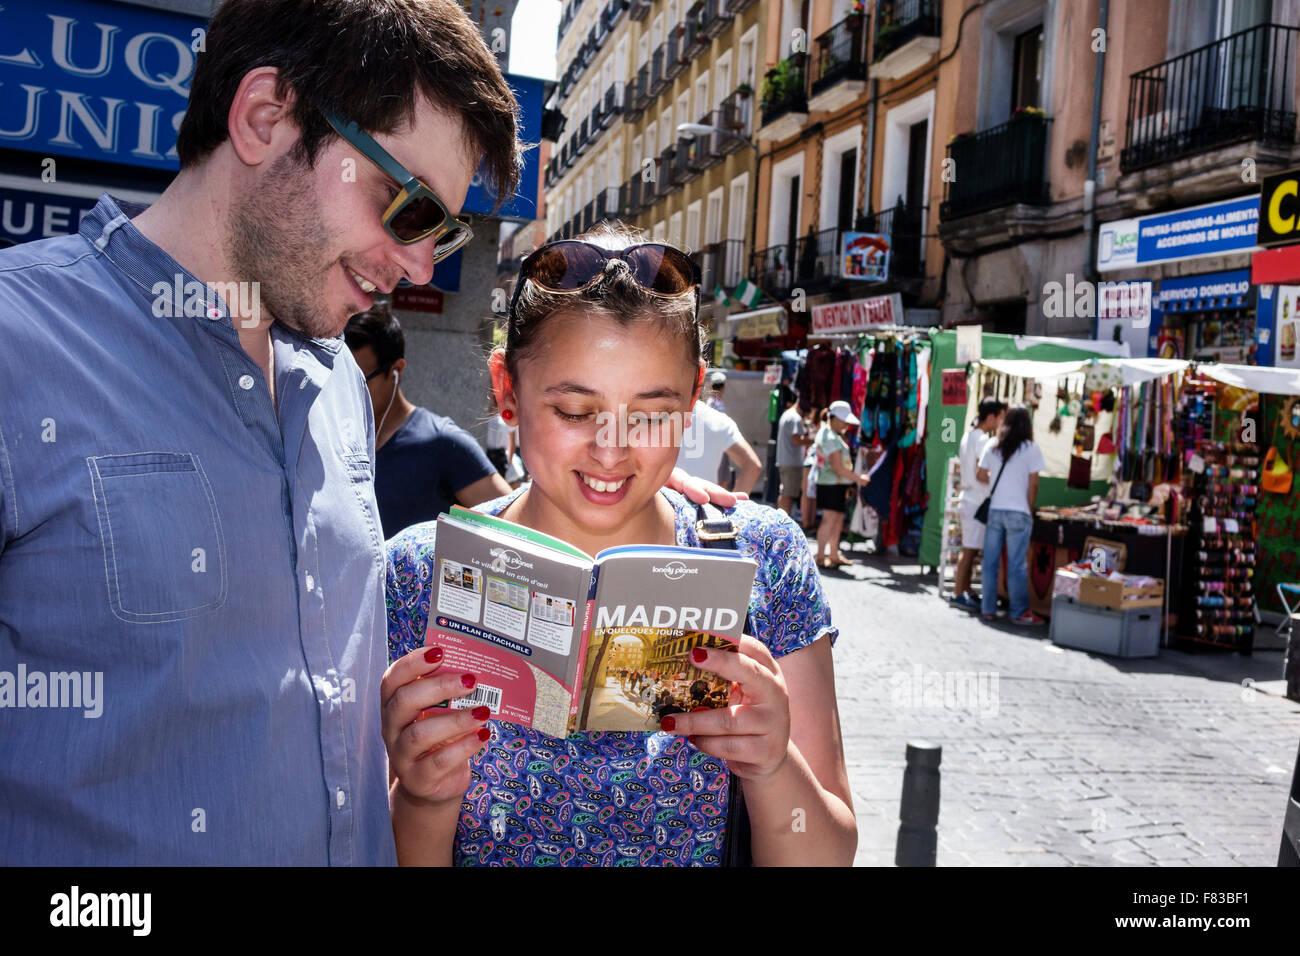 Spain Europe Spanish Hispanic Madrid Barrio de La Latina el Rastro flea market Plaza de Cascorro Ribera de Curtidores - Stock Image